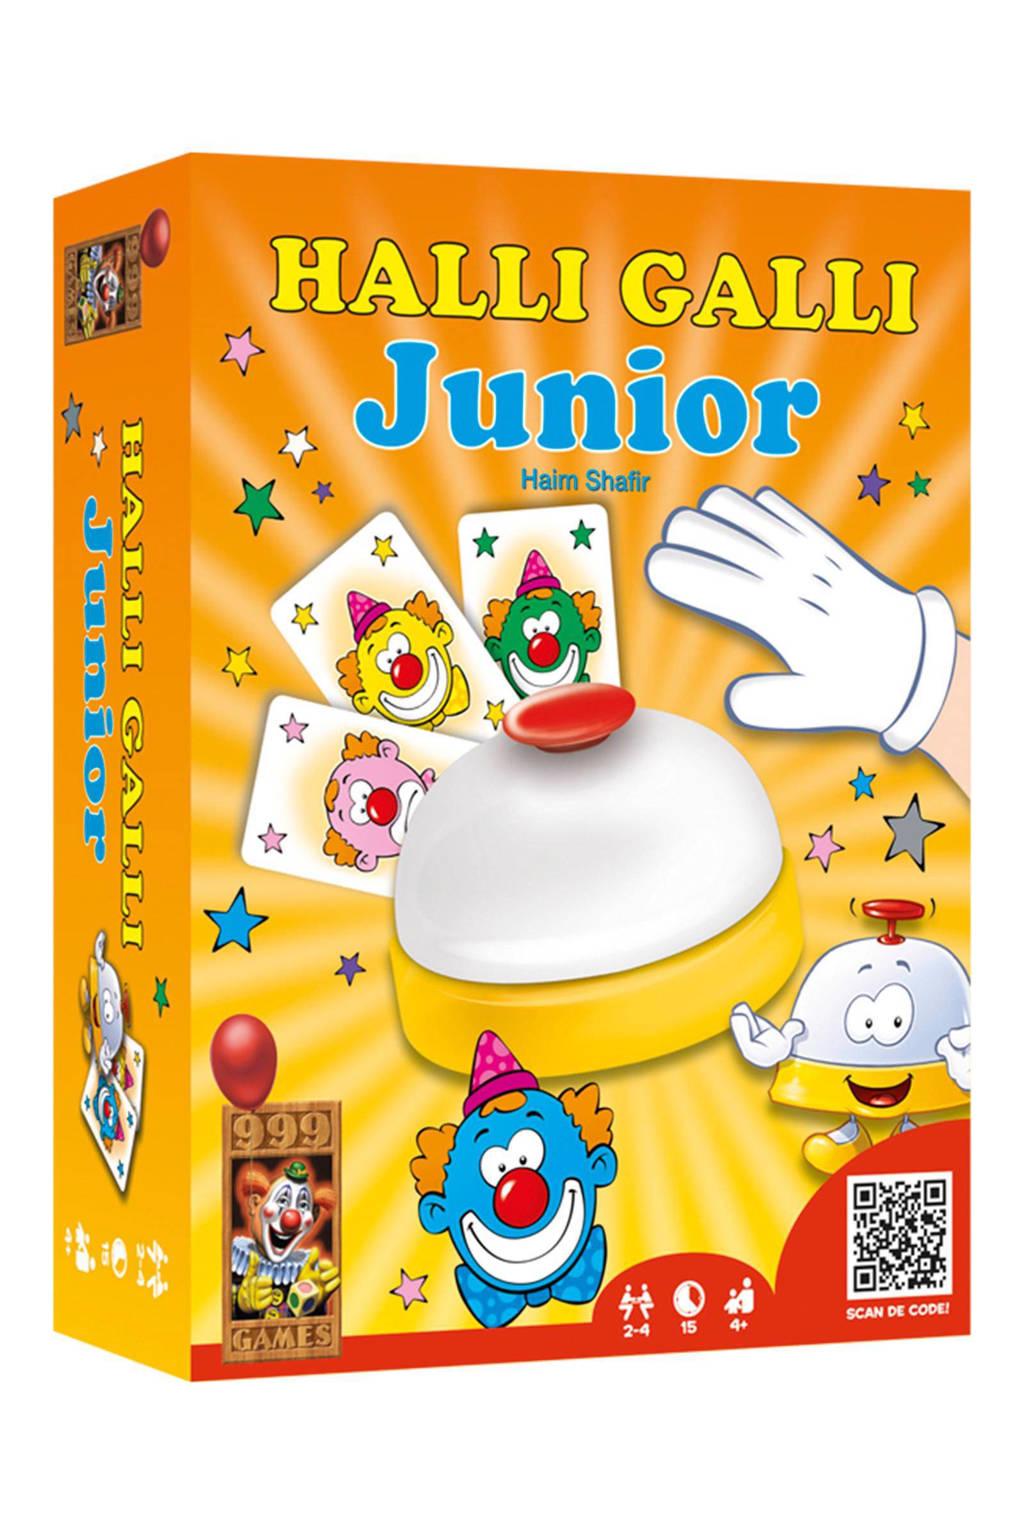 999 Games Halli Galli junior kinderspel kaartspel